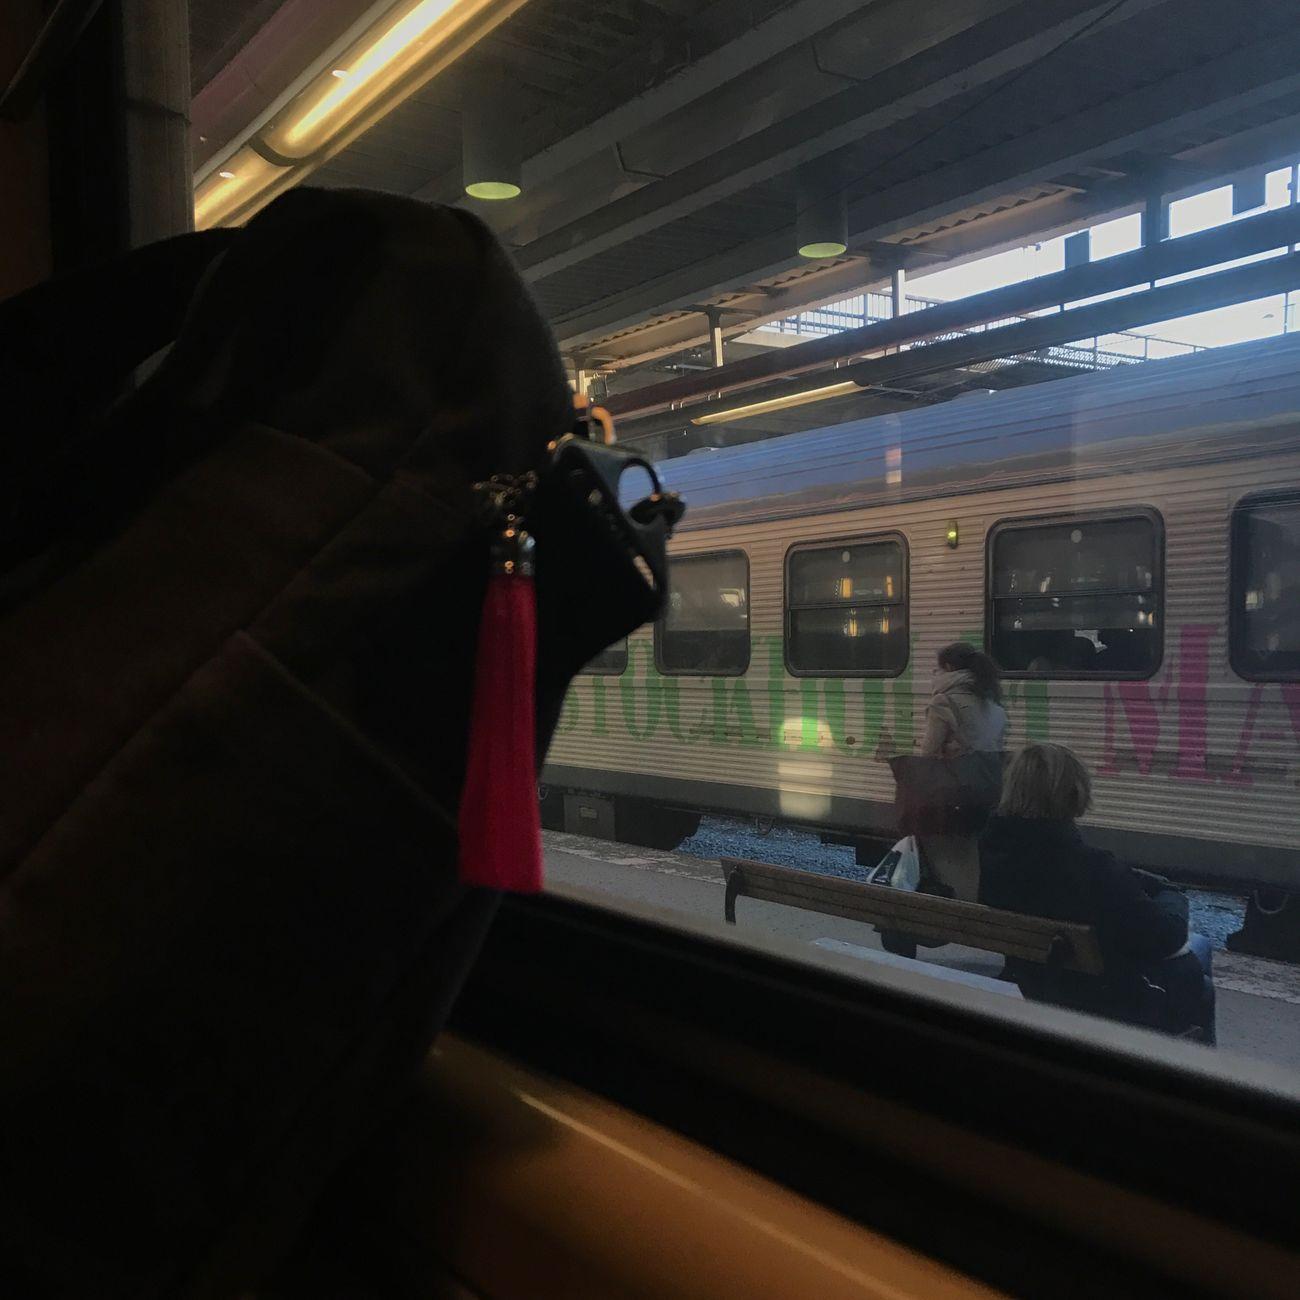 Train - Vehicle Vehicle Interior Two People Transportation